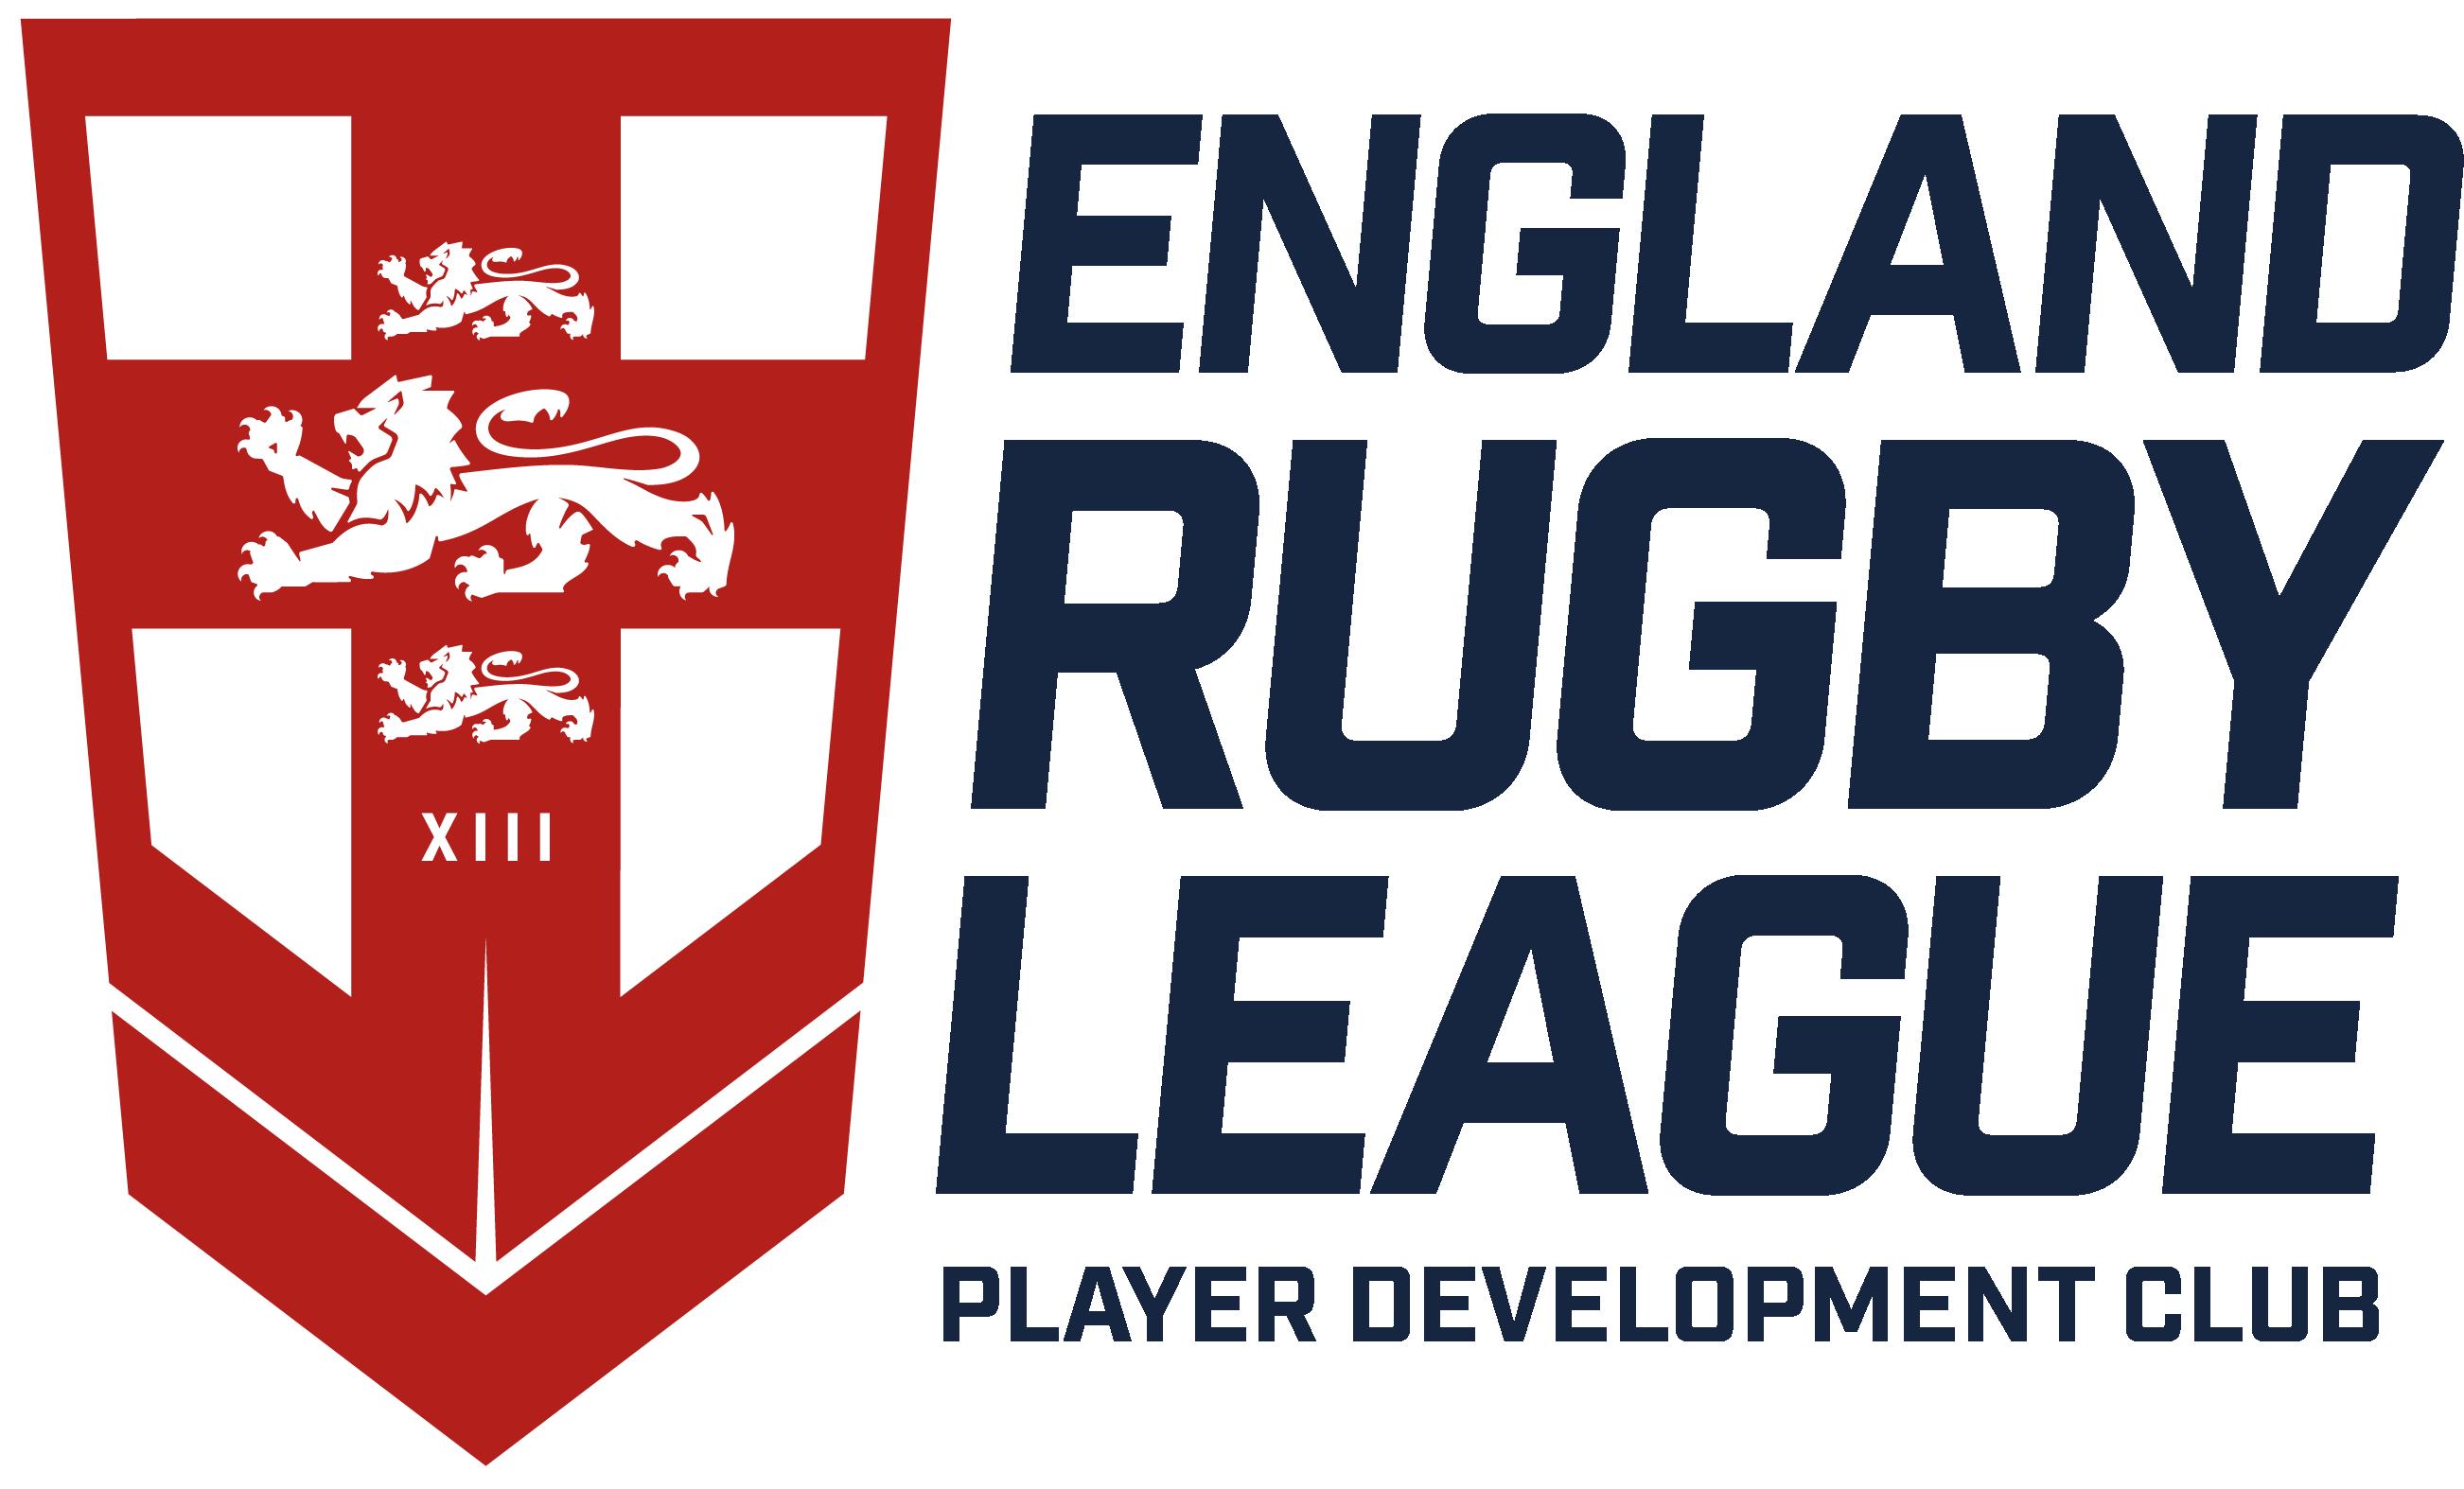 ETP_Player_Development_Club_RGB